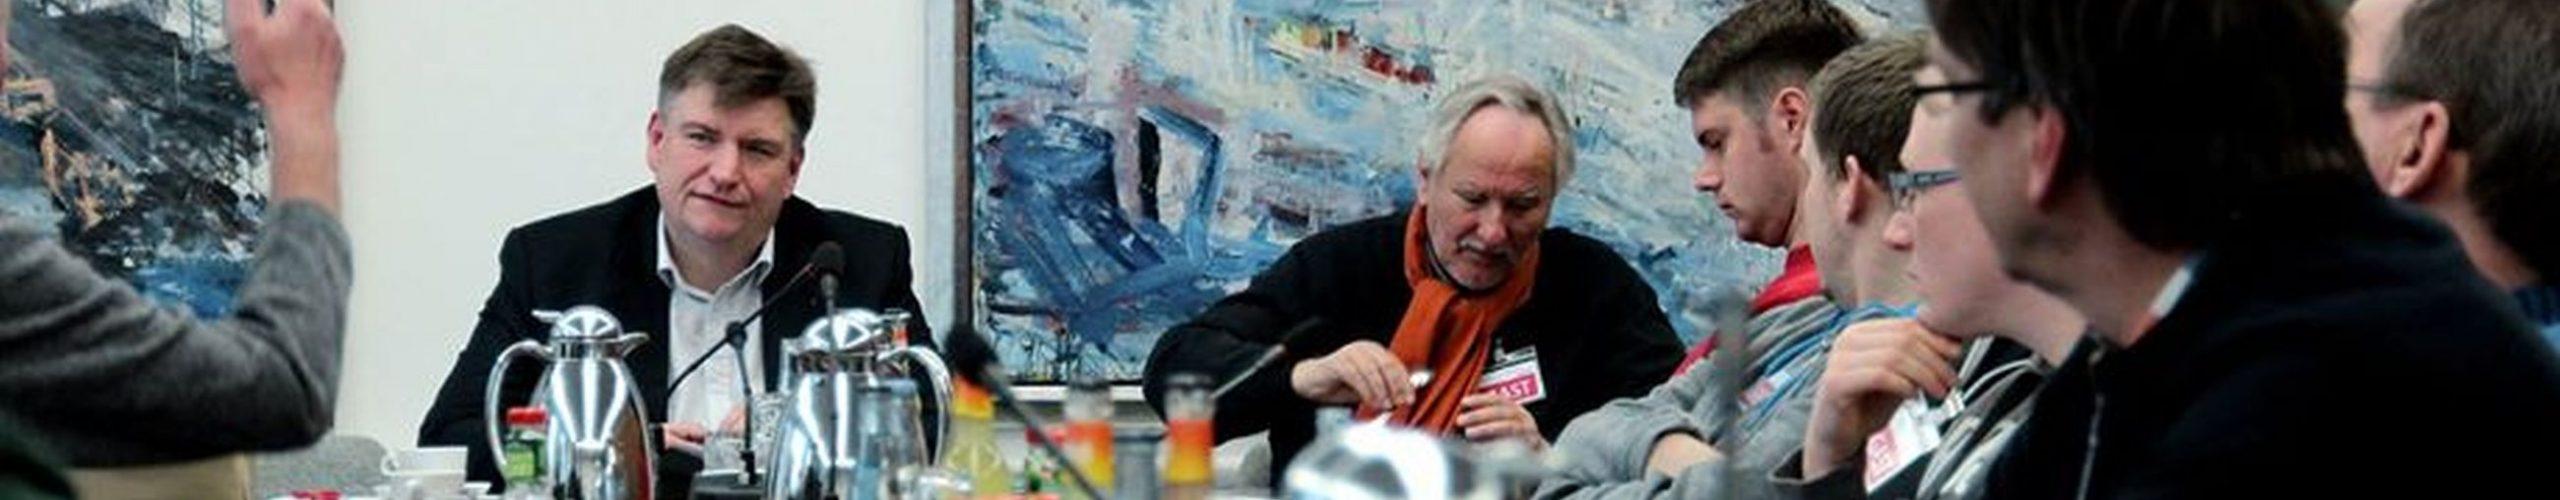 Rainer Hamann, MdBB